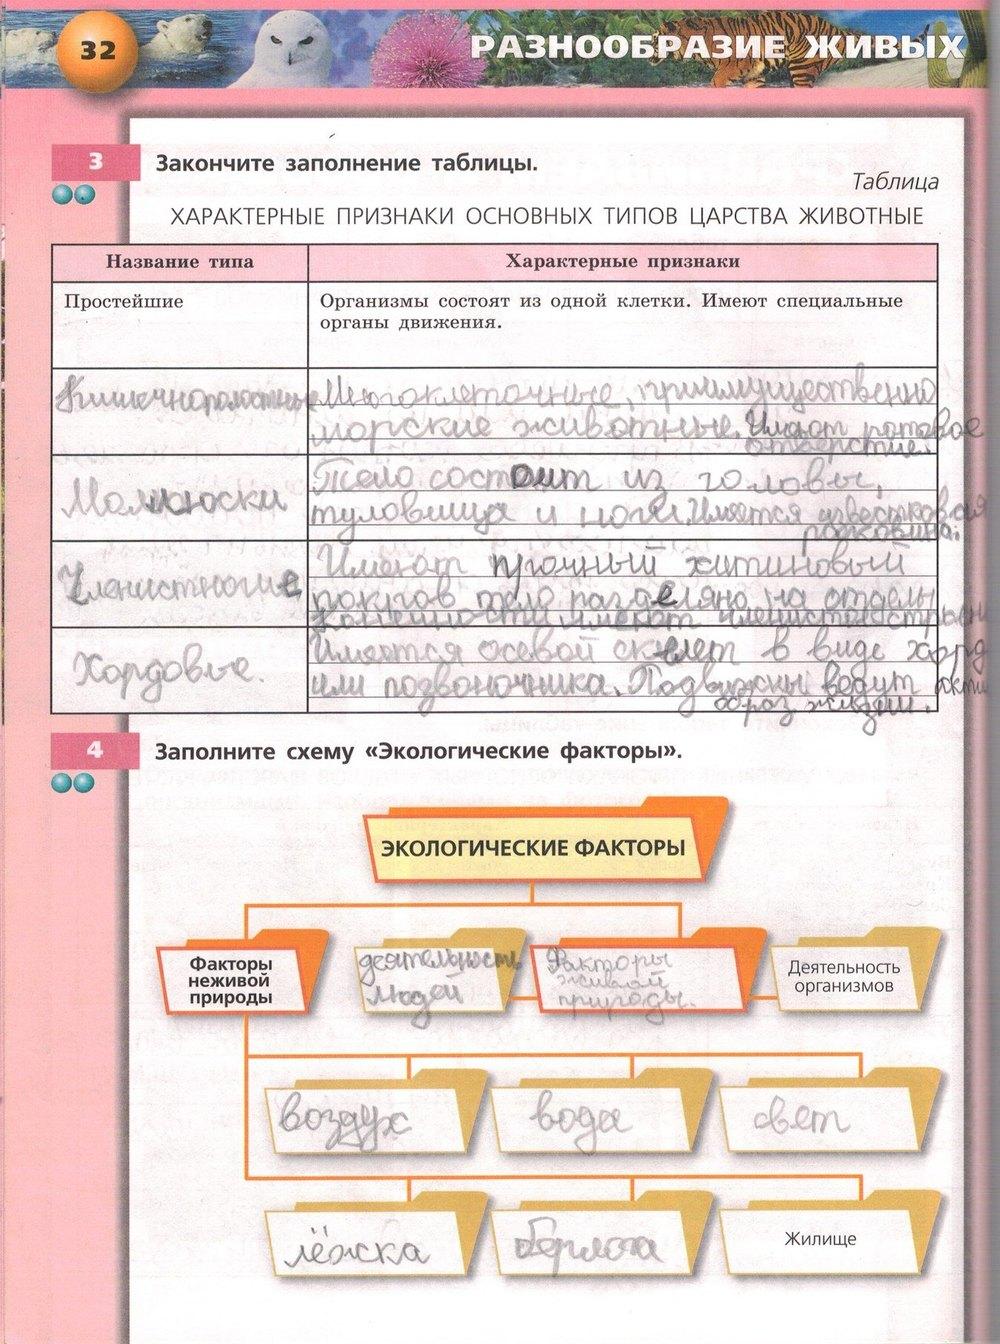 Рабочая программа сухорукова 5 класс